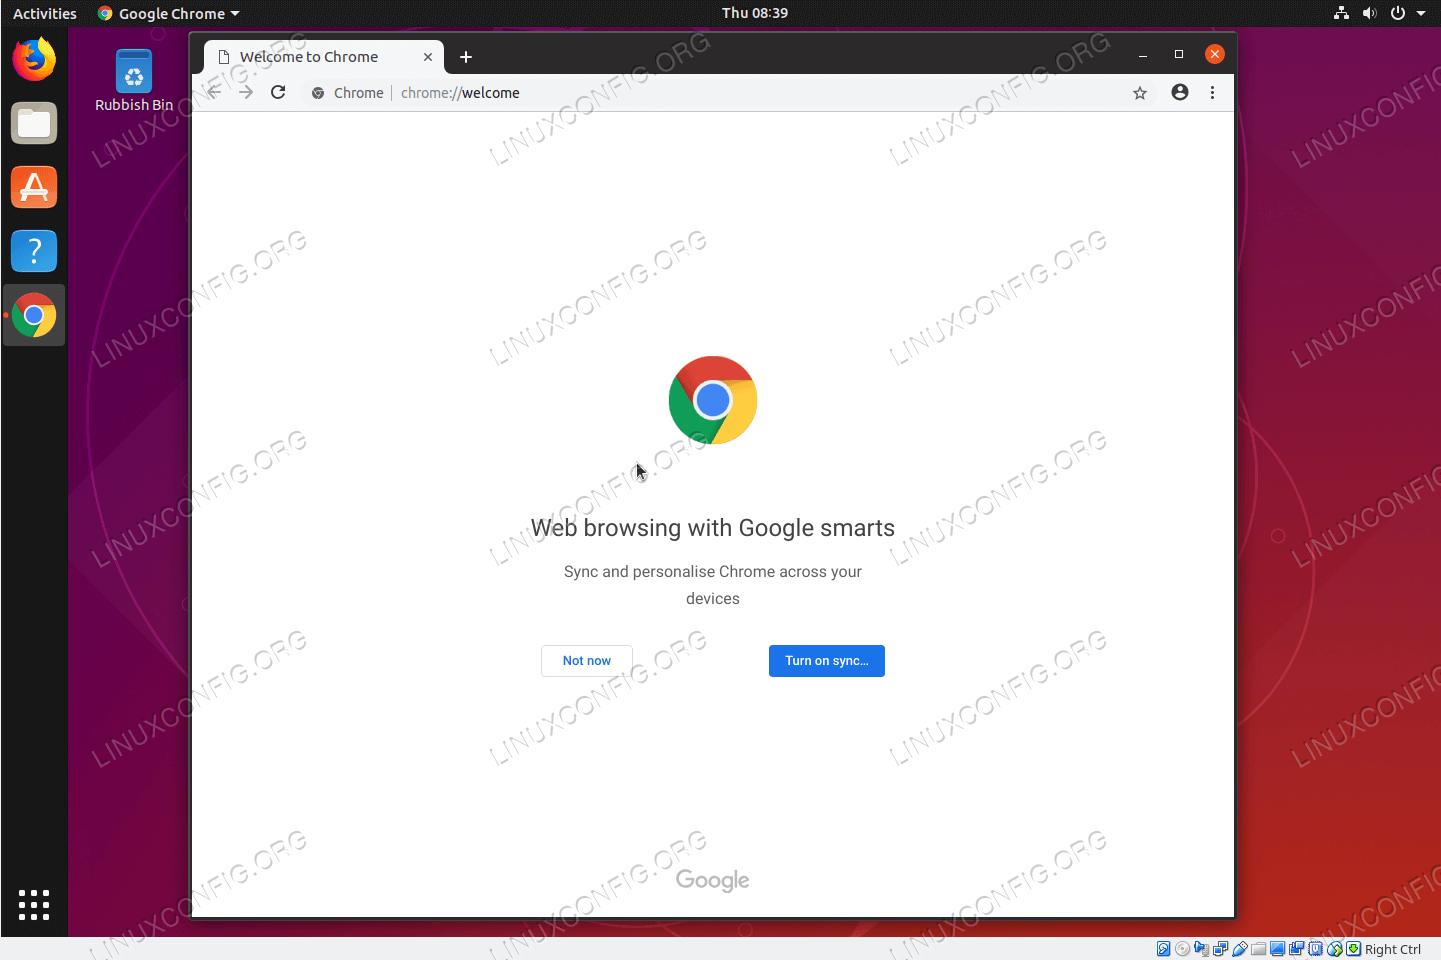 Google Chrome Browser on Ubuntu 18.10 Cosmic Cuttlefish Linux